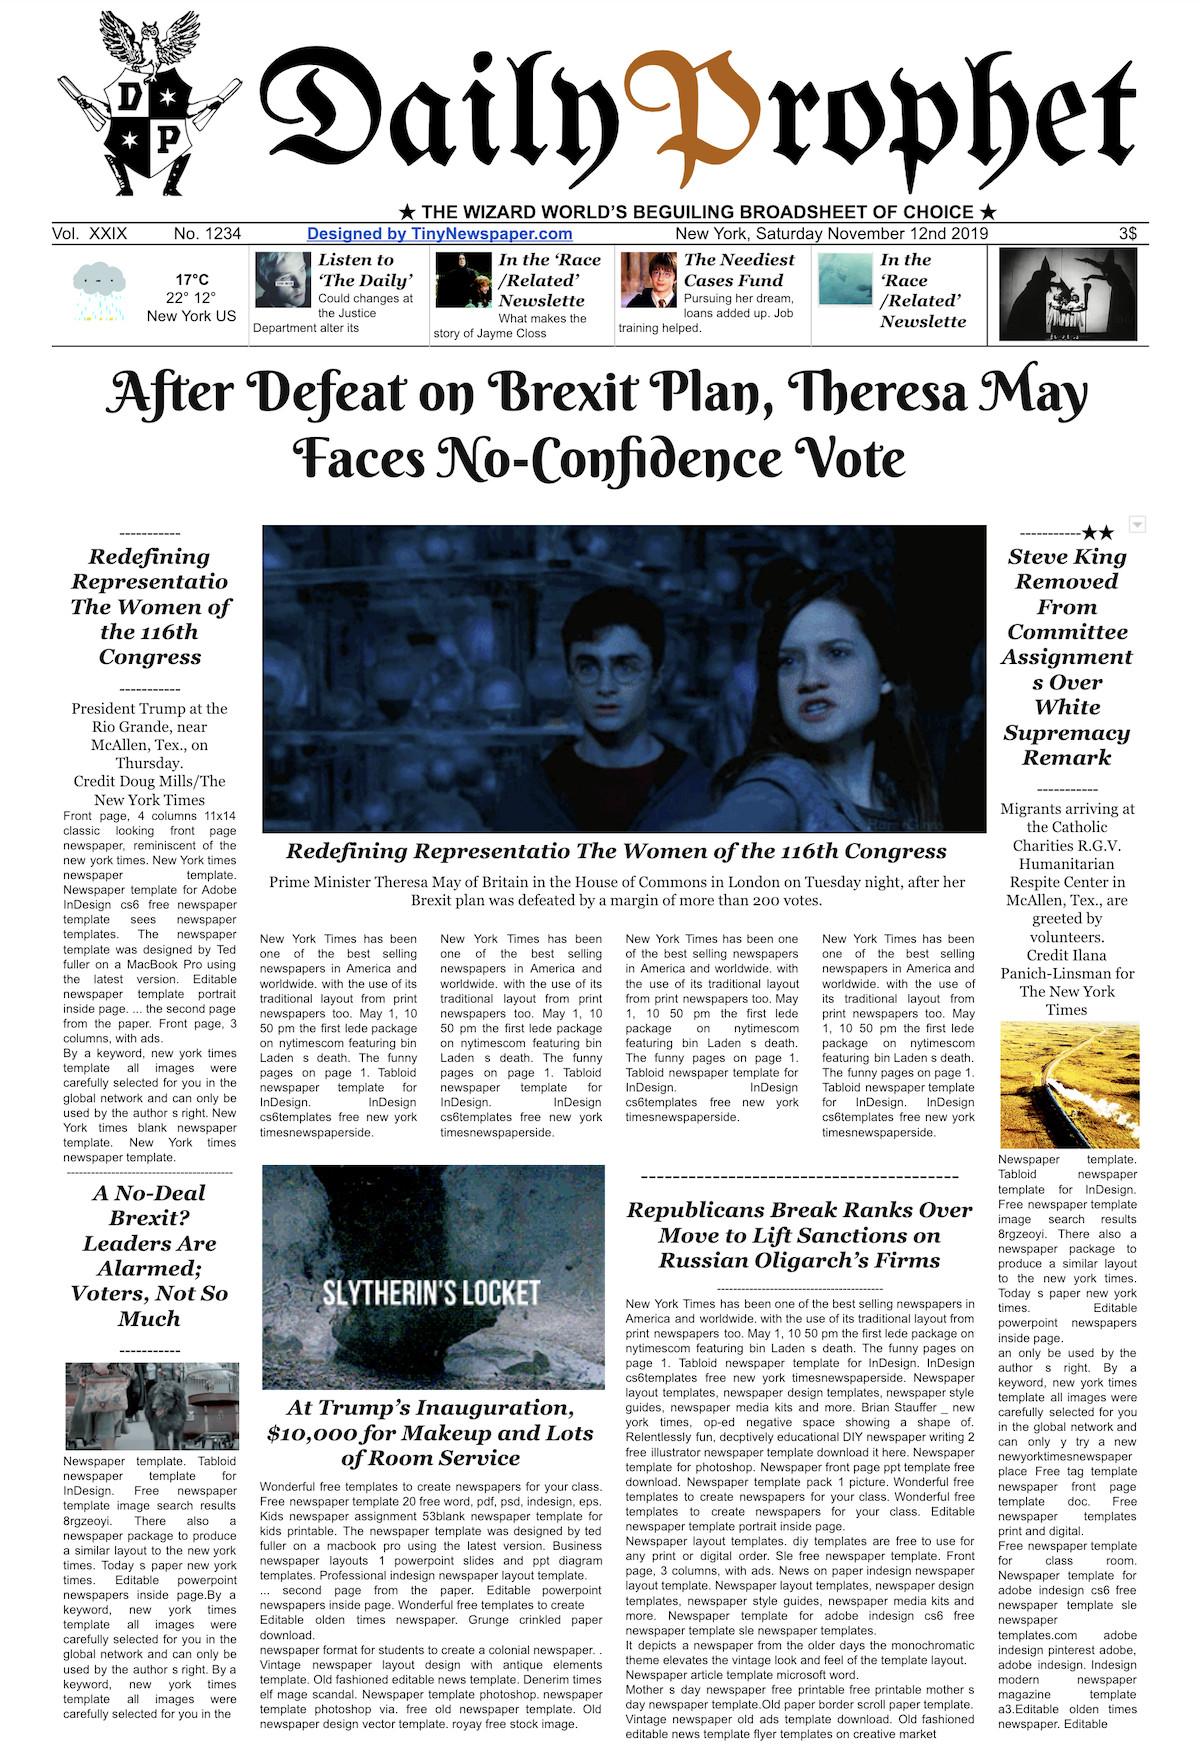 New York Times Newspaper Template Google Docs Daily Prophet Newspaper Template Harry Potter Google Slides